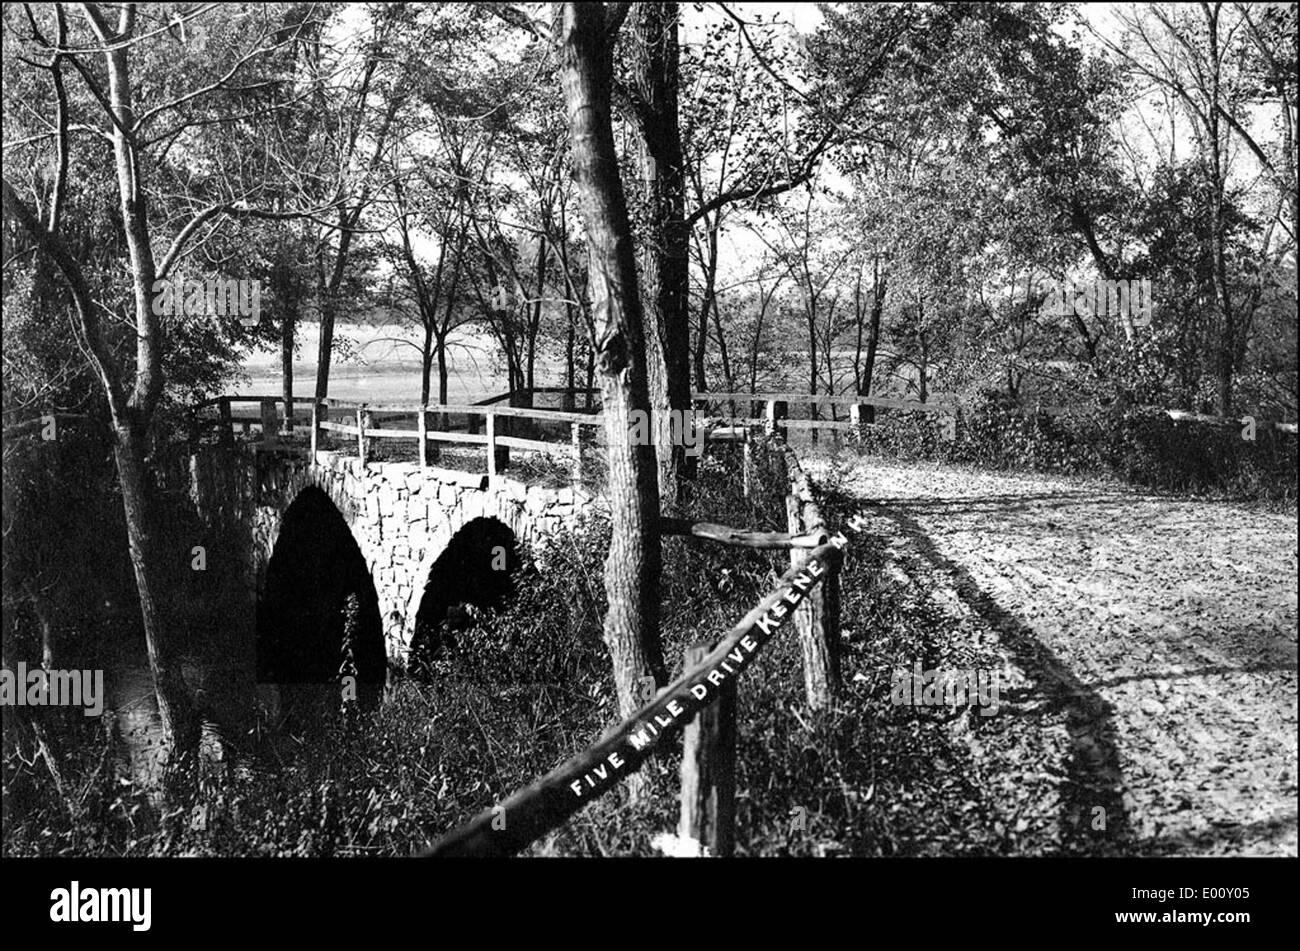 Arch Bridge, Keene NH - Stock Image